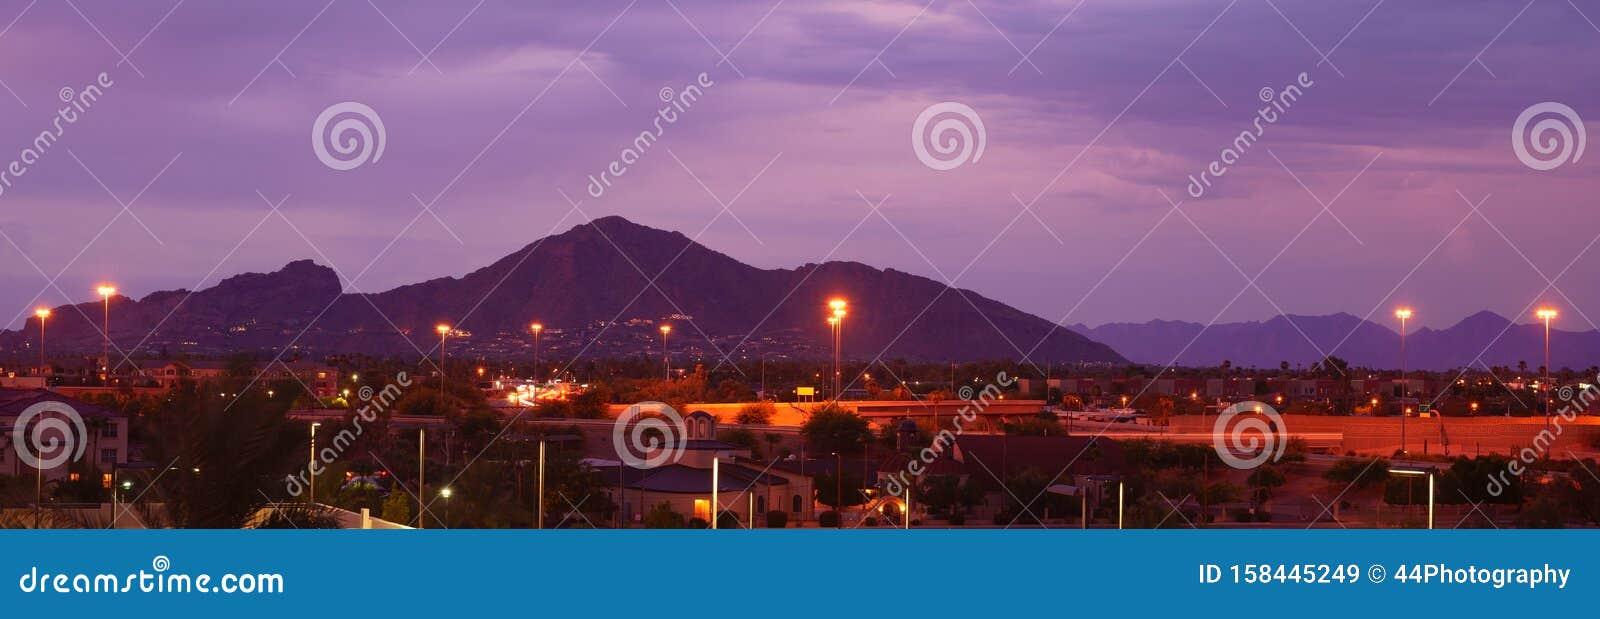 Phoenix, Arizona, USA cityscape at night with famous Camelback Mountain.